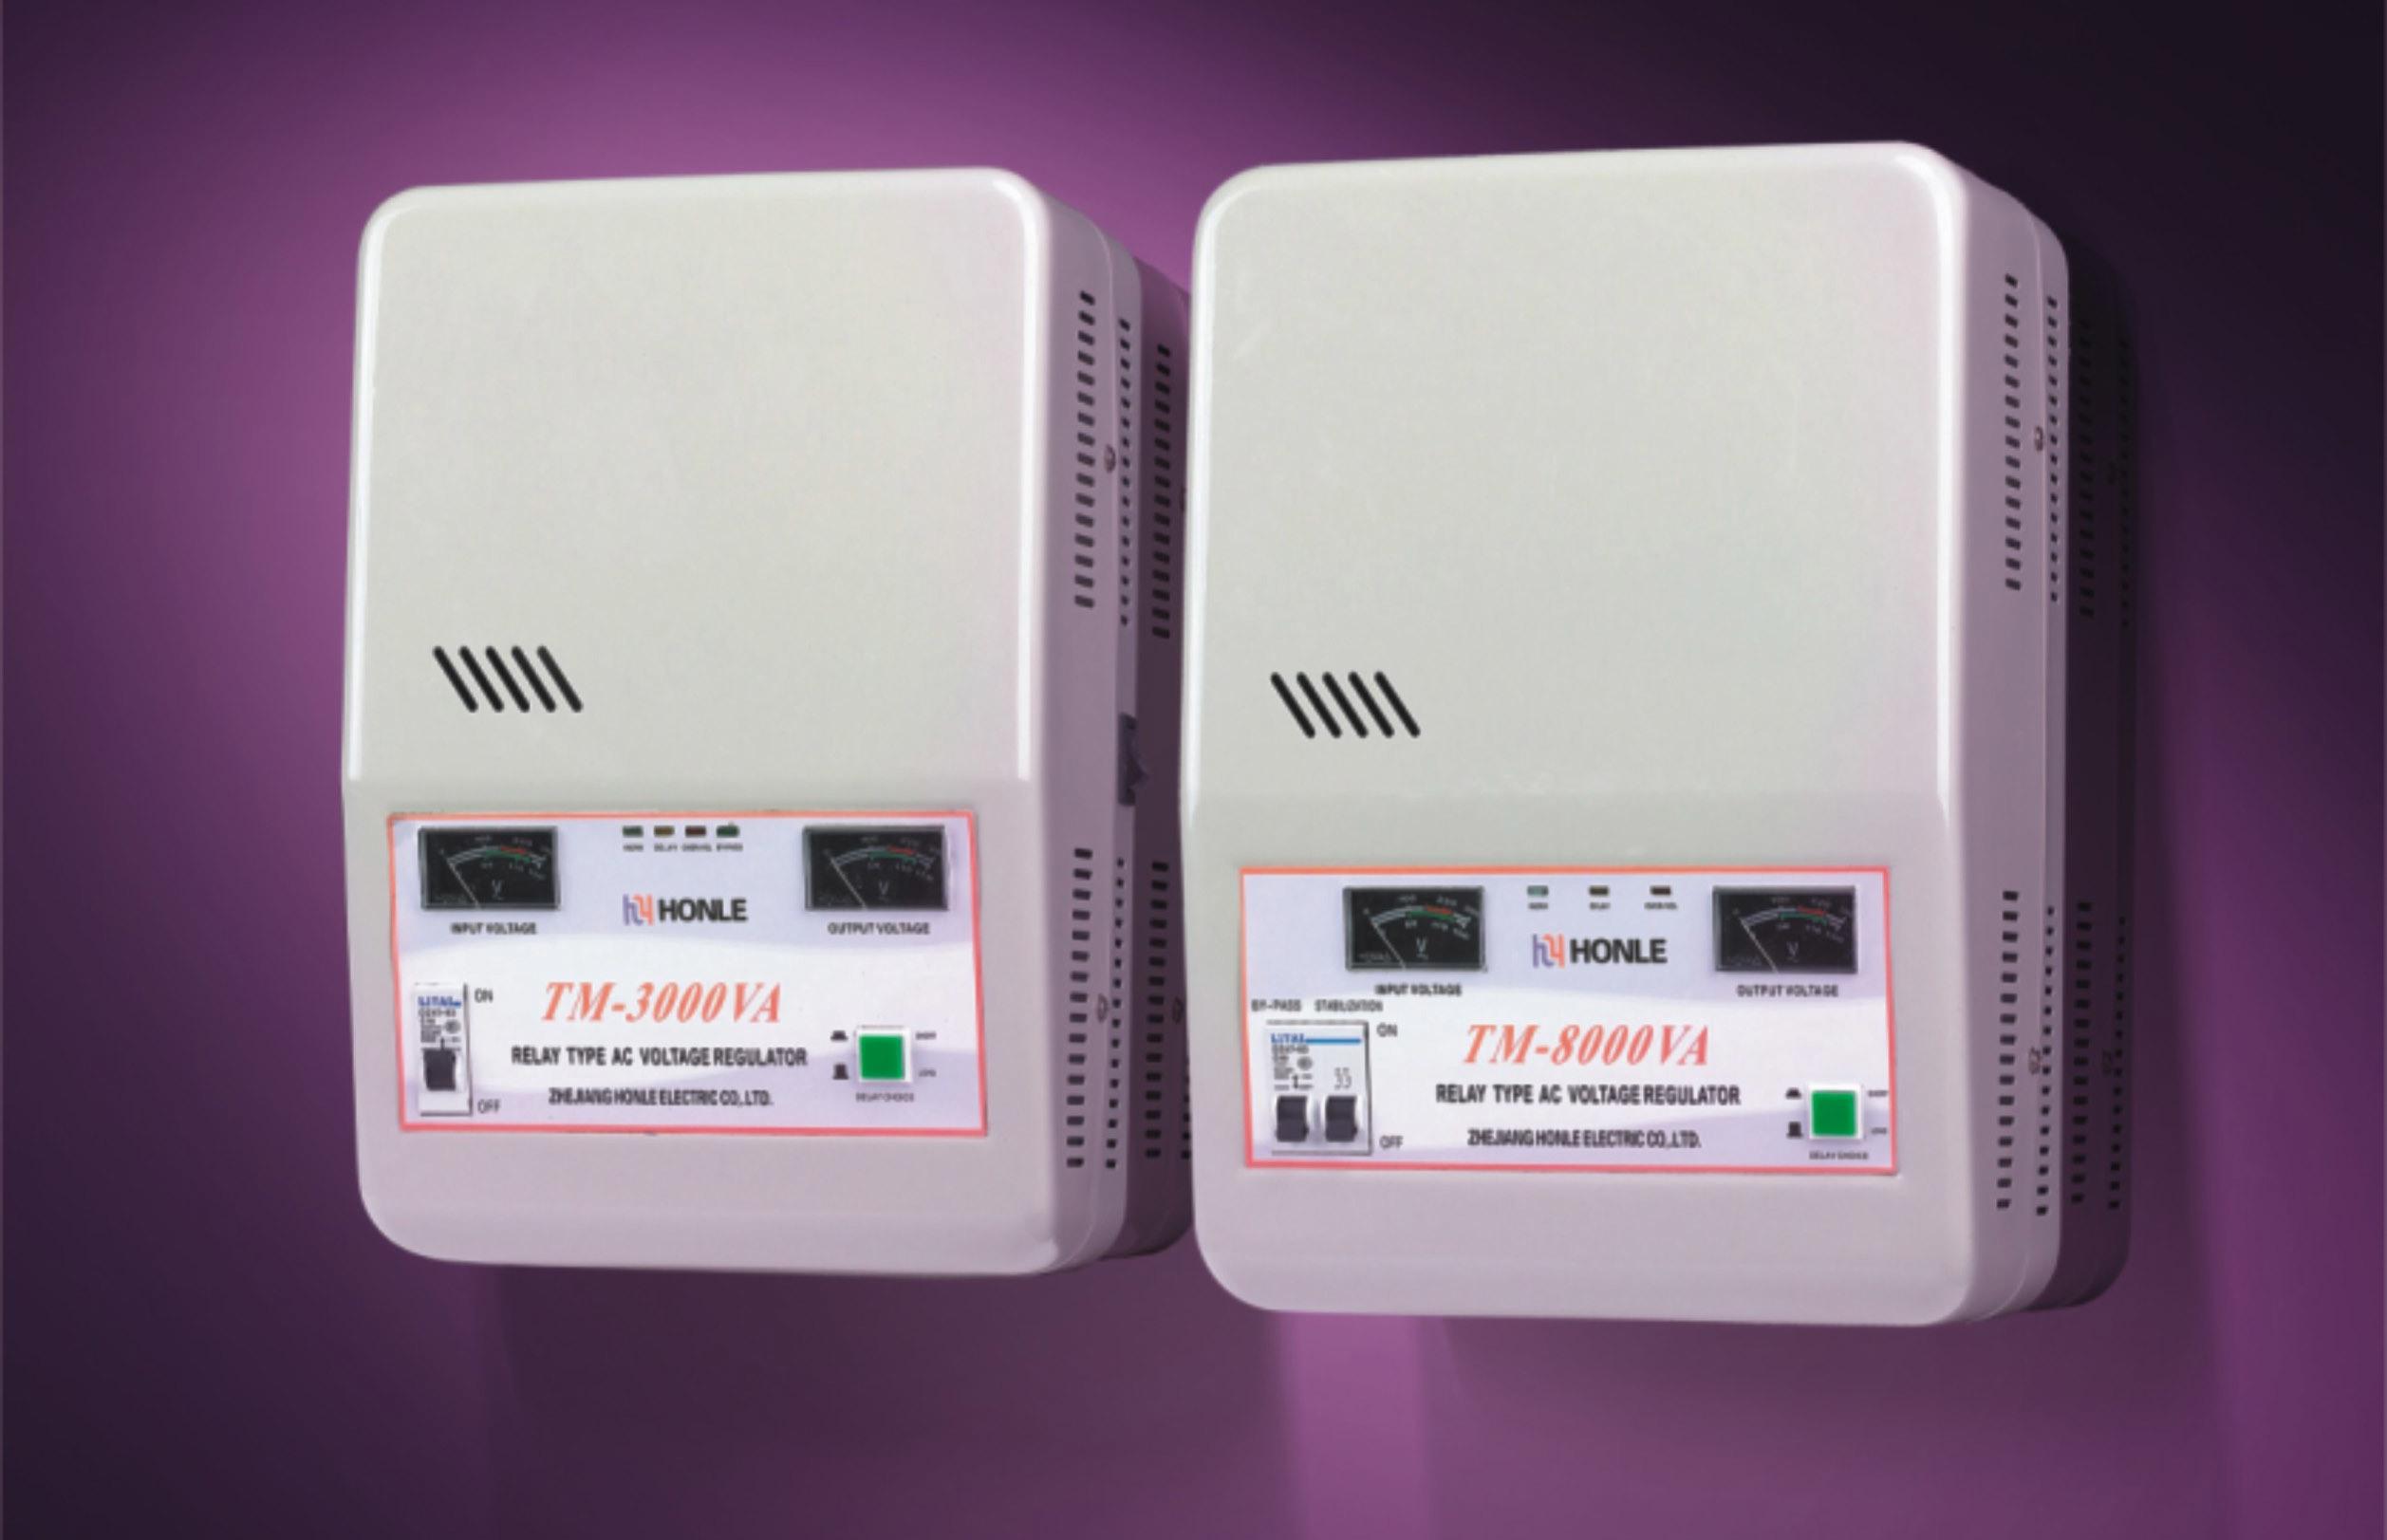 Honle TM Series Rely Type AVR Wall Mounted (TM)